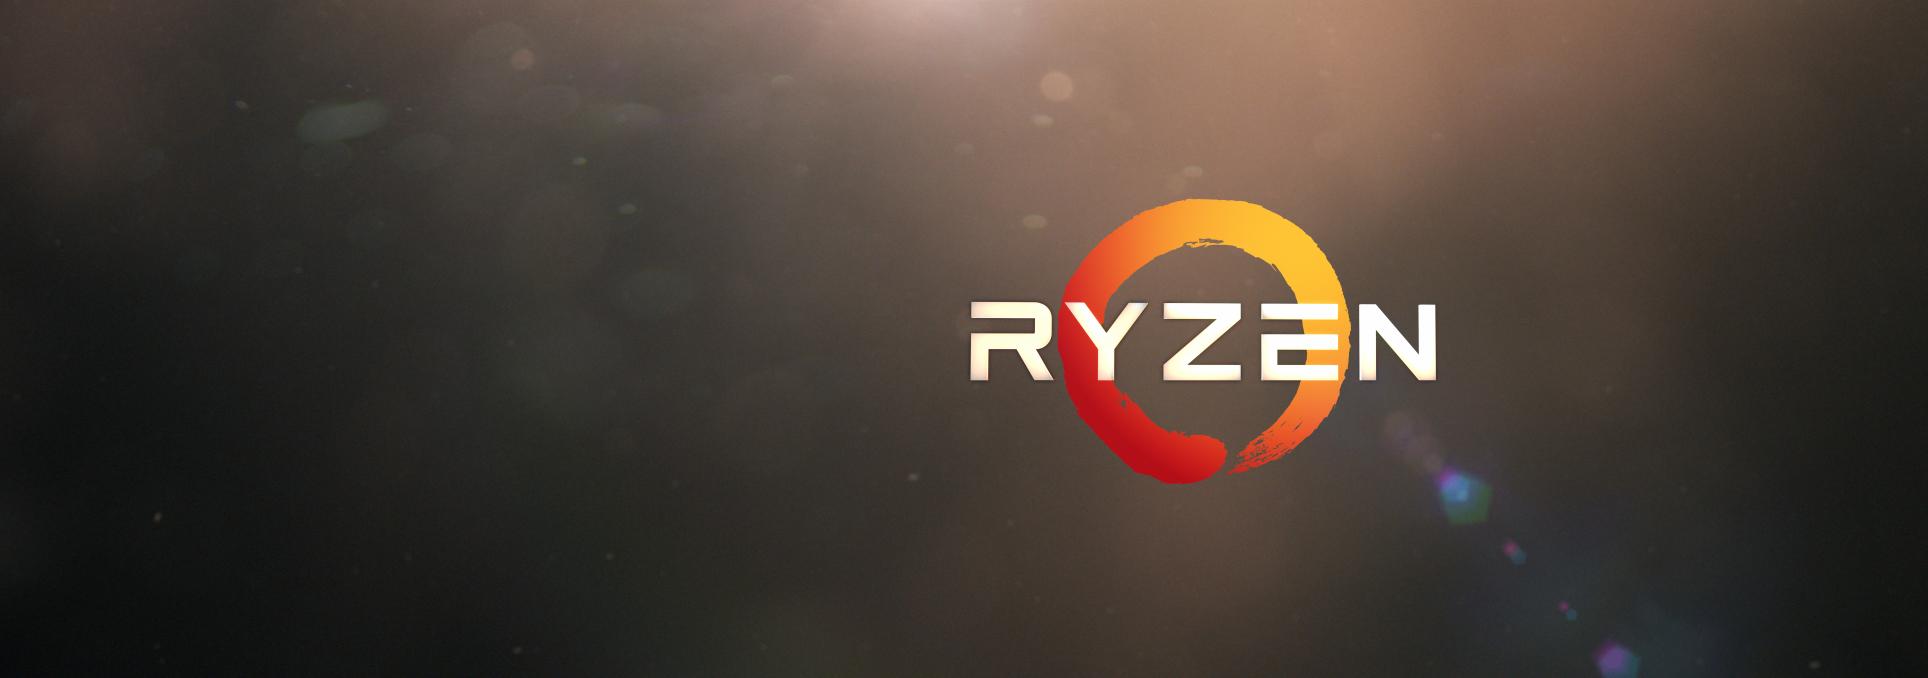 Ryzen CPU logo